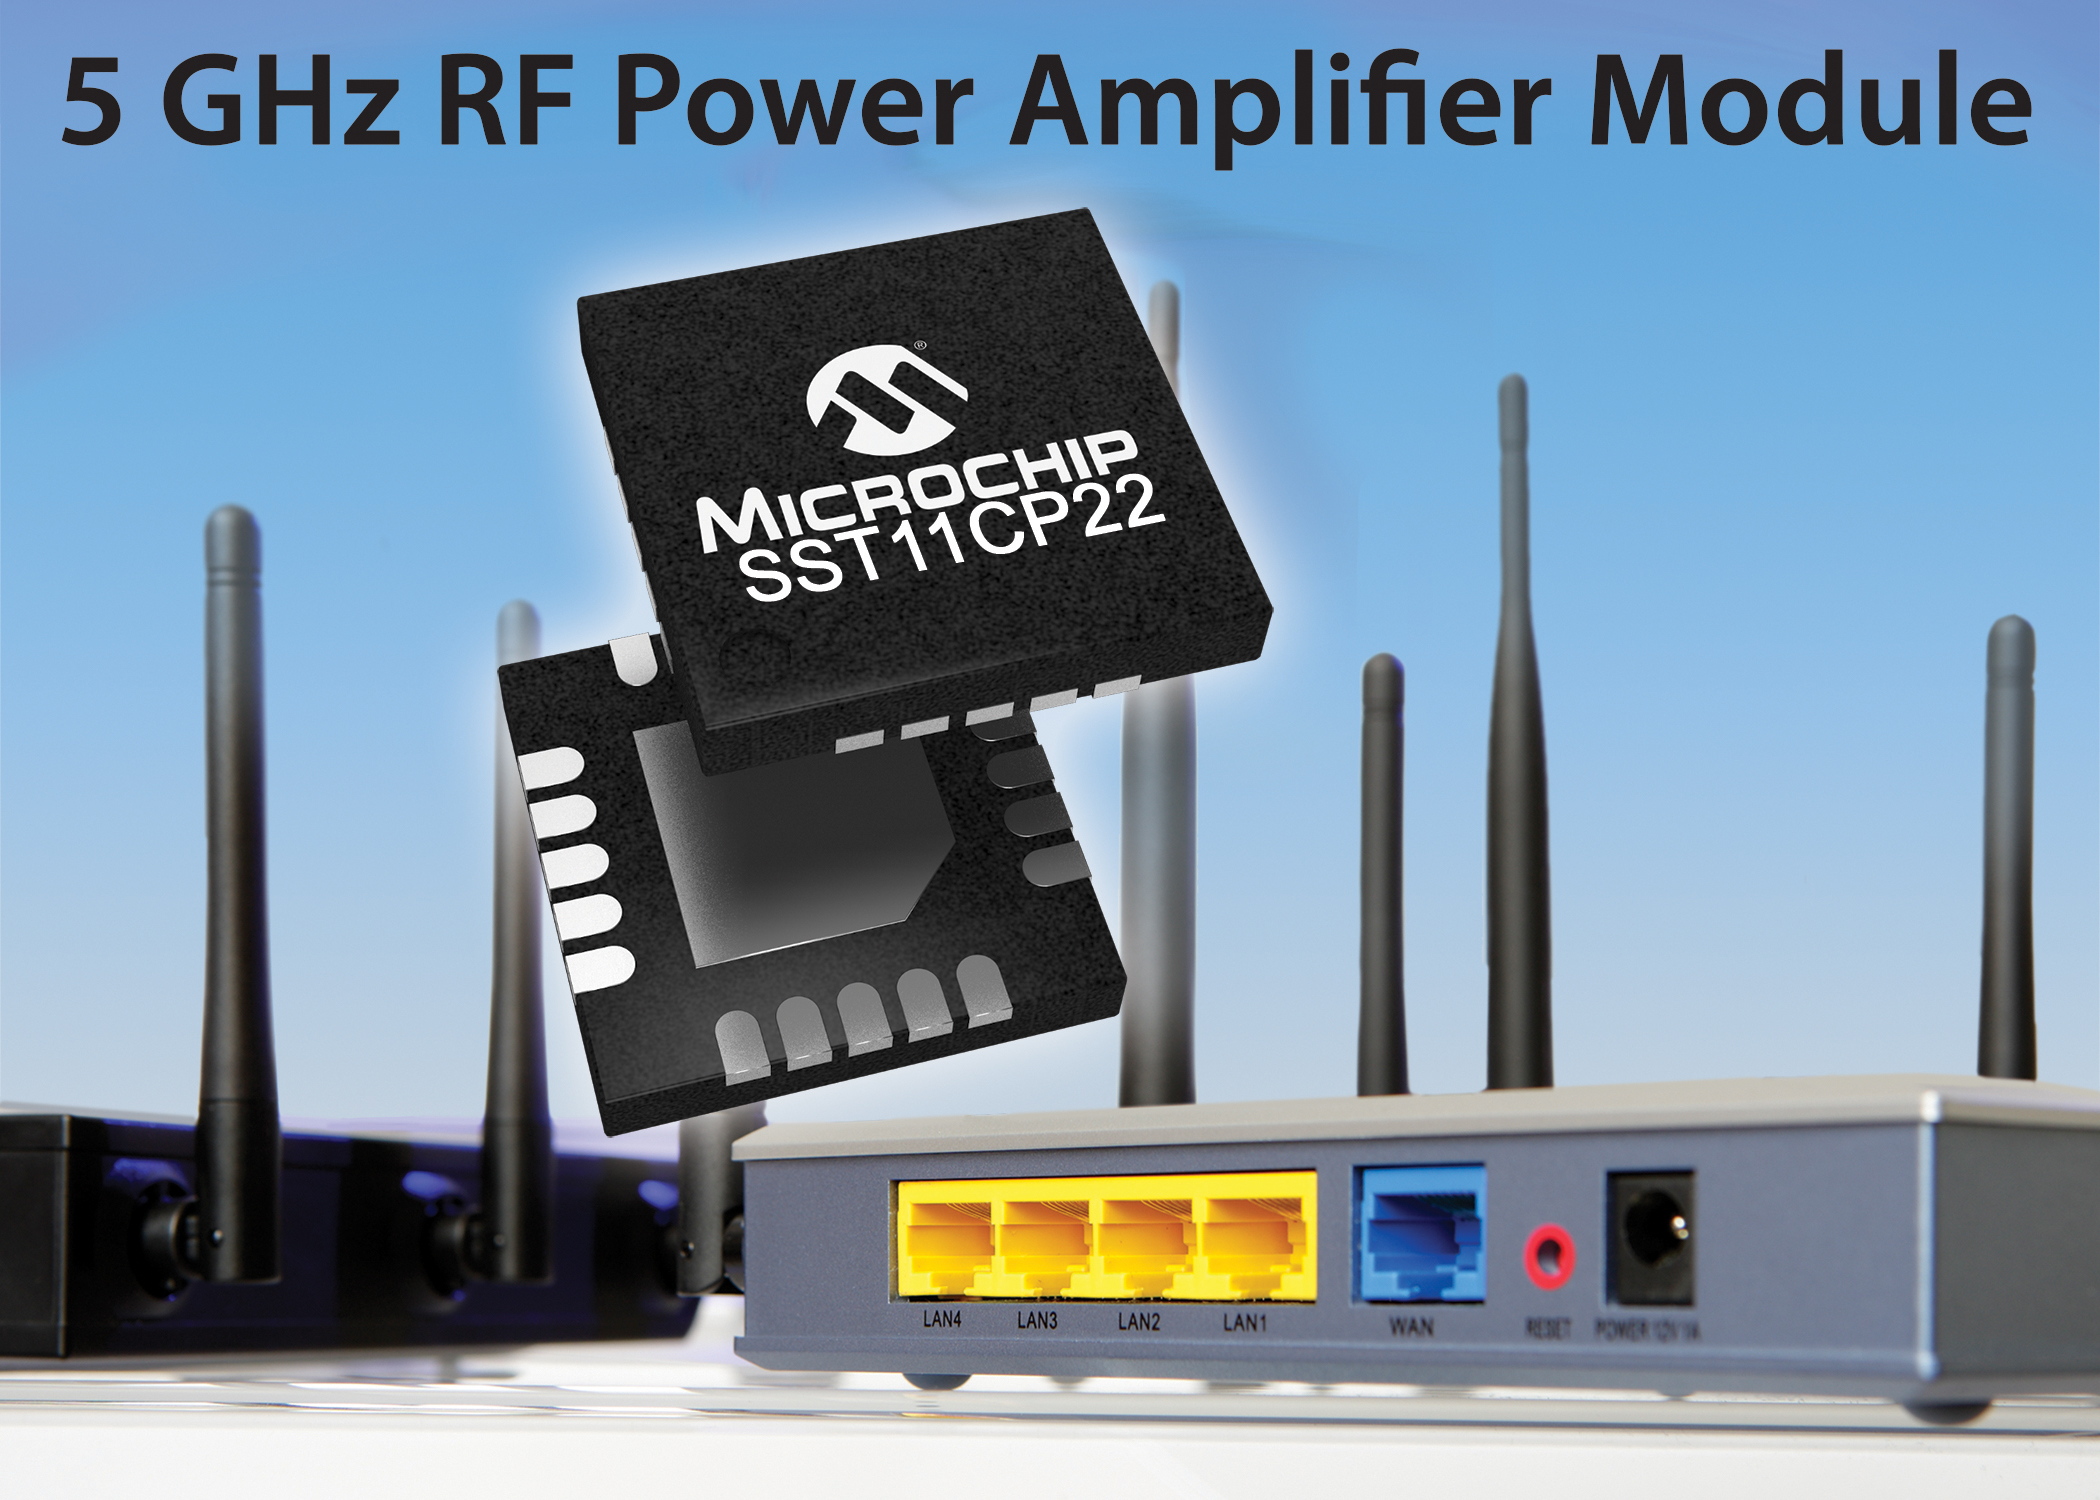 Microchip推出基于IEEE 802.11ac Wi-Fi标准的全新5 GHz功率放大器模块